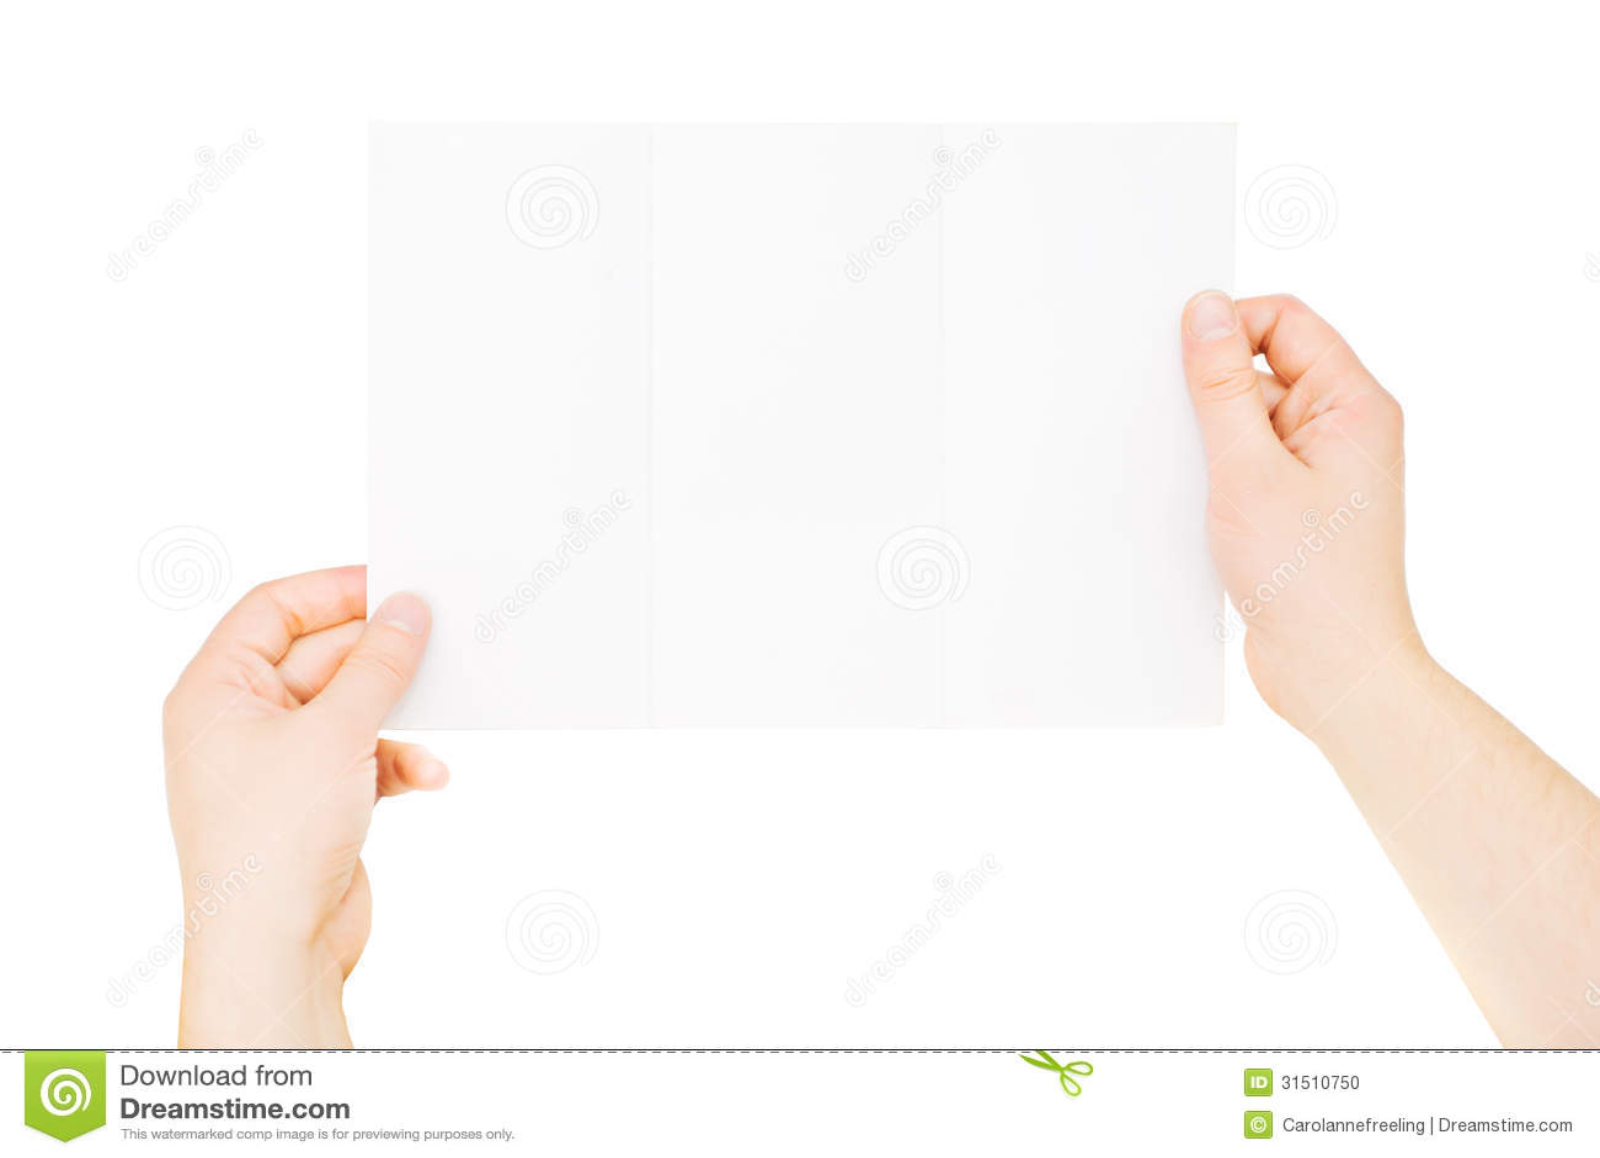 hands holding trifold empty brochure  slightly folded